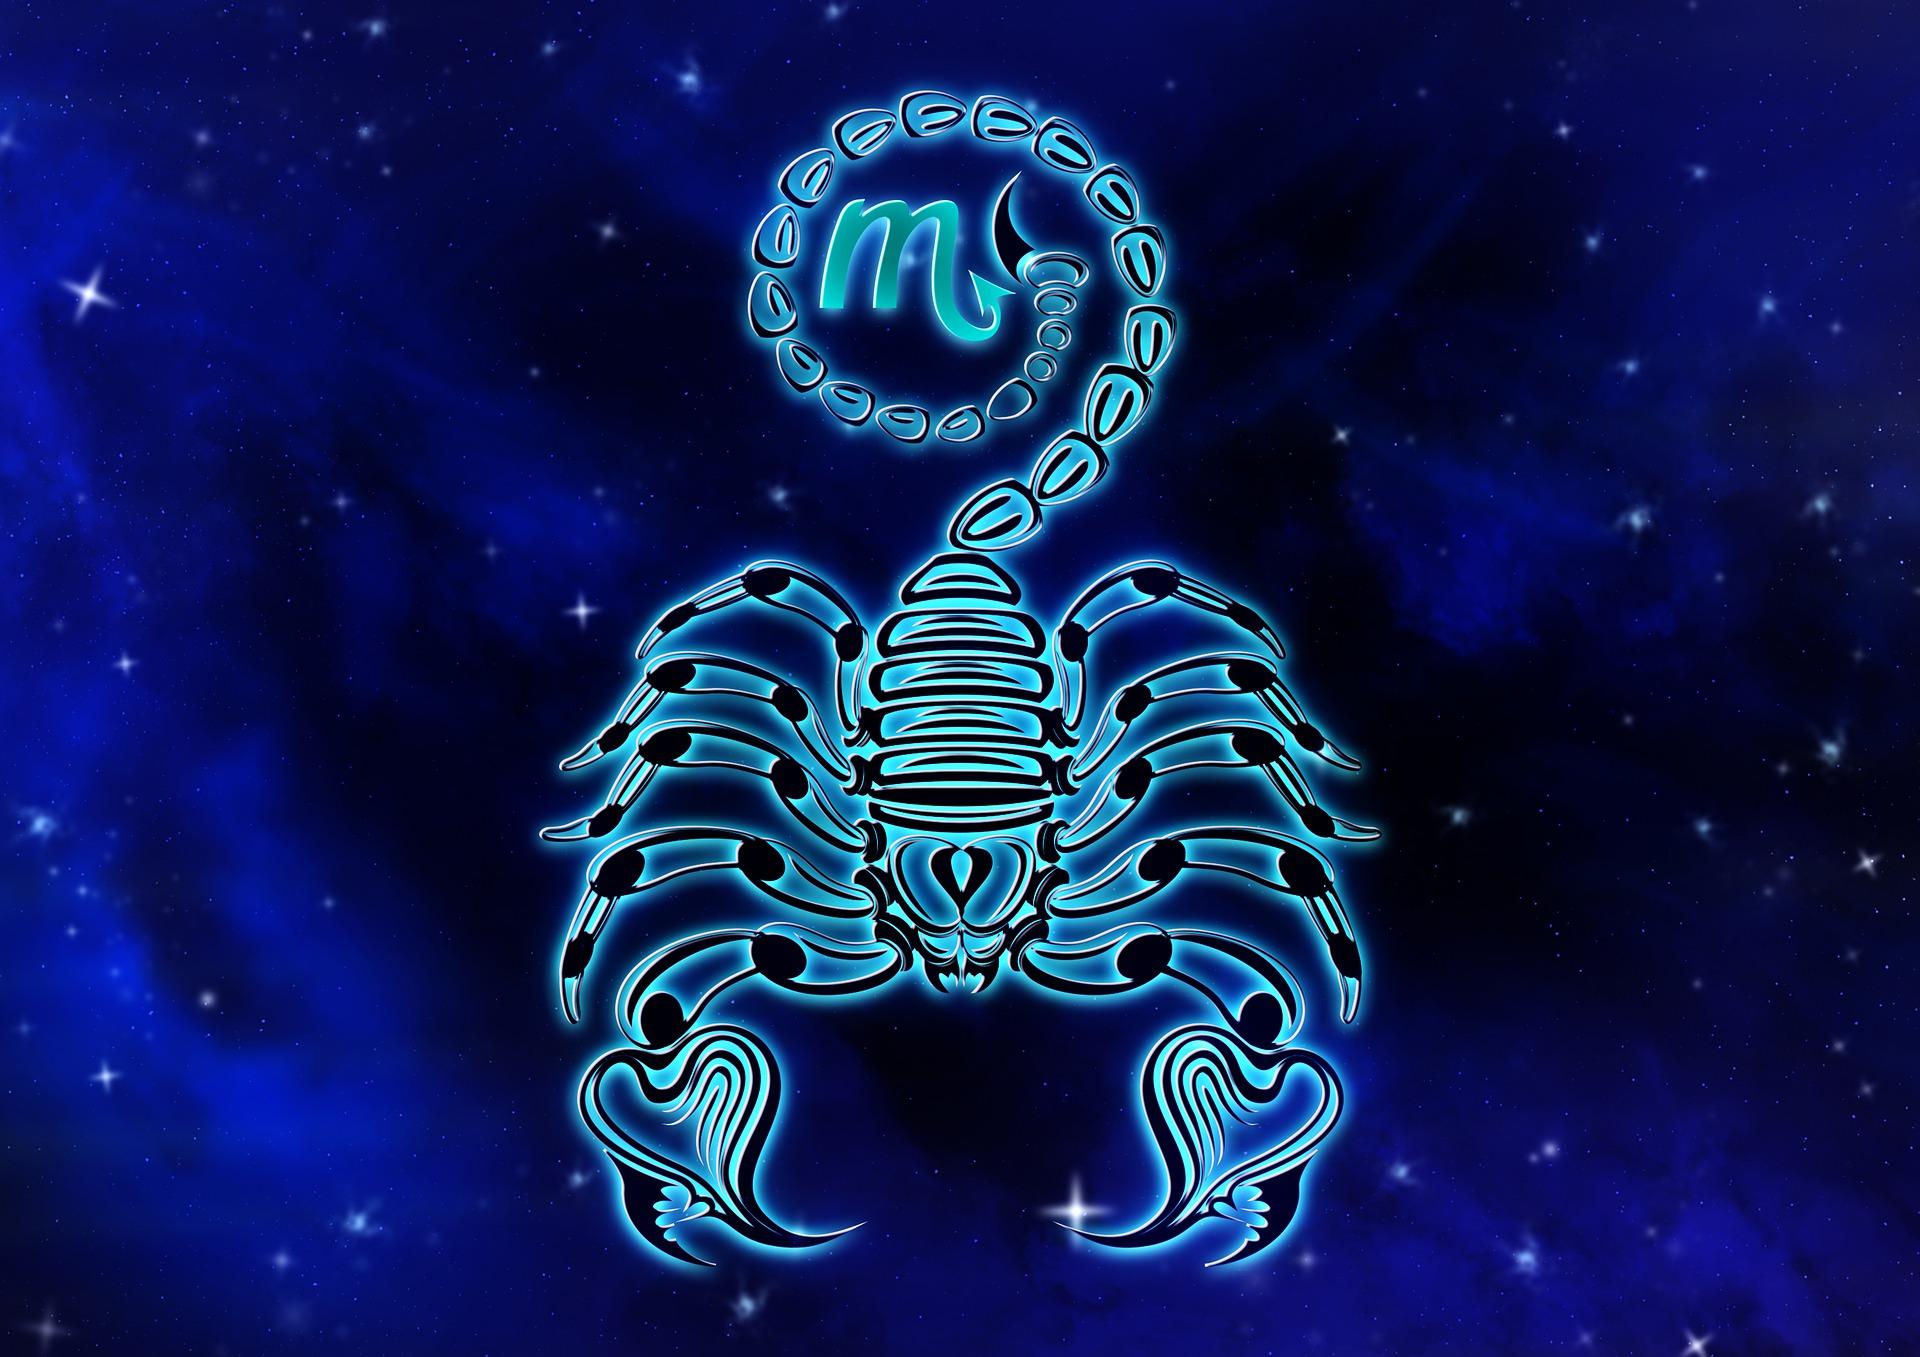 Škorpija godišnji horoskop 2020